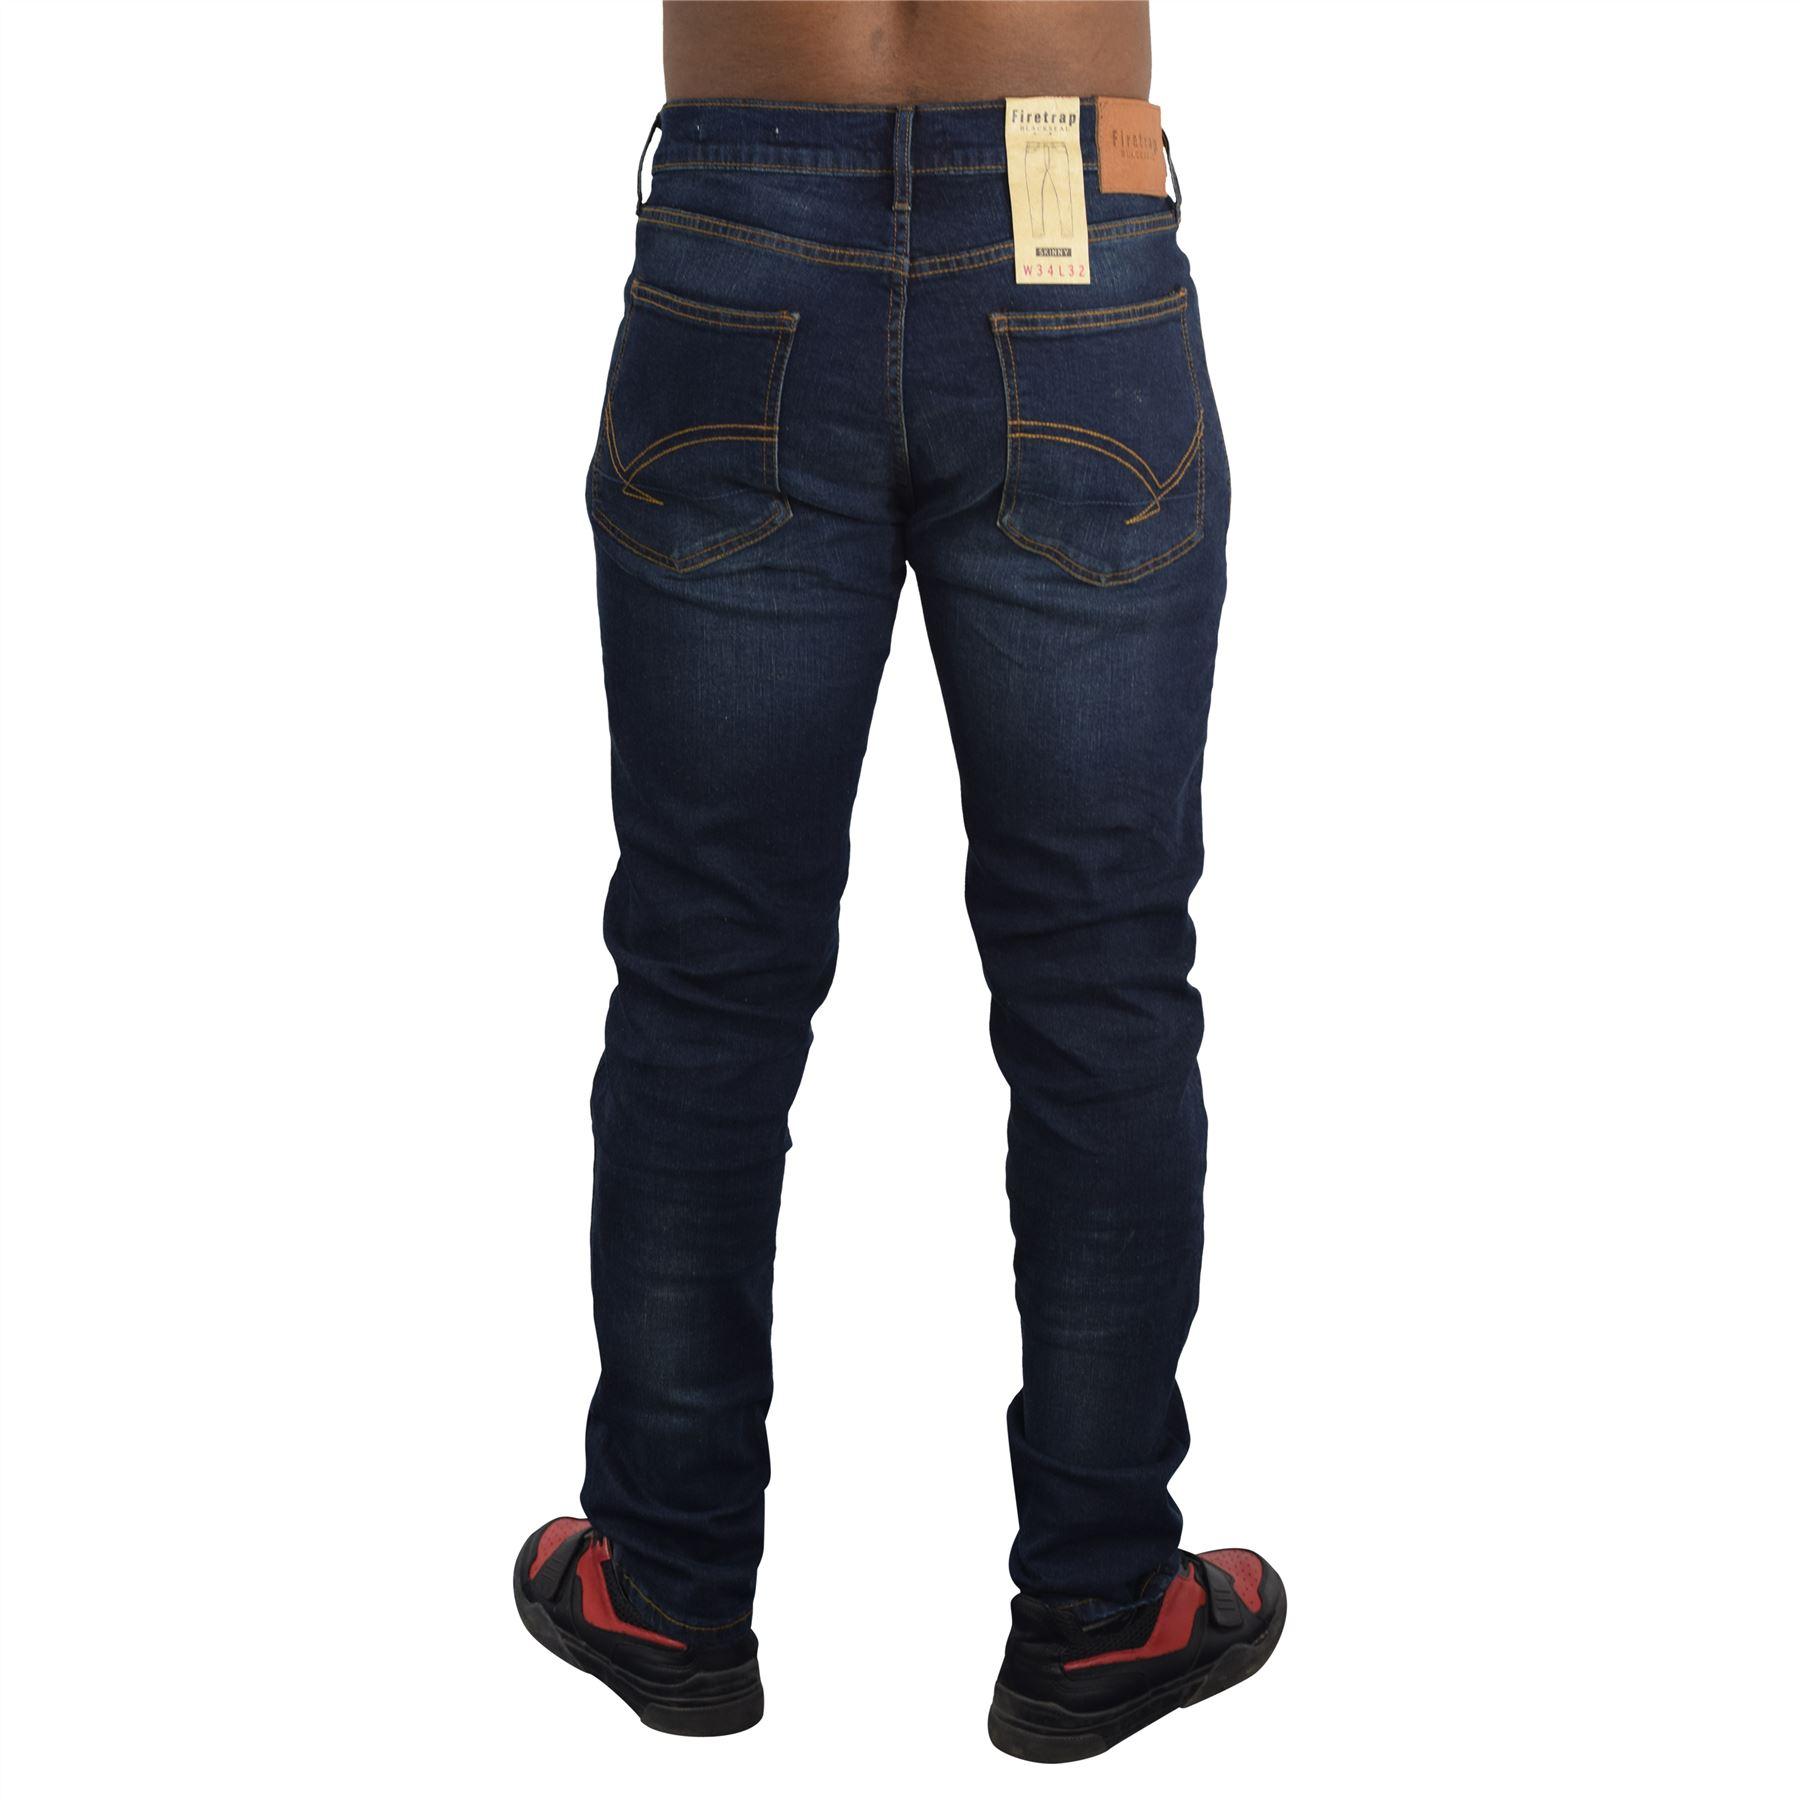 Nuevo-Para-Hombres-Firetrap-Jeans-skinny-fit-de-algodon-Pantalones-informales-Pantalones-de miniatura 5